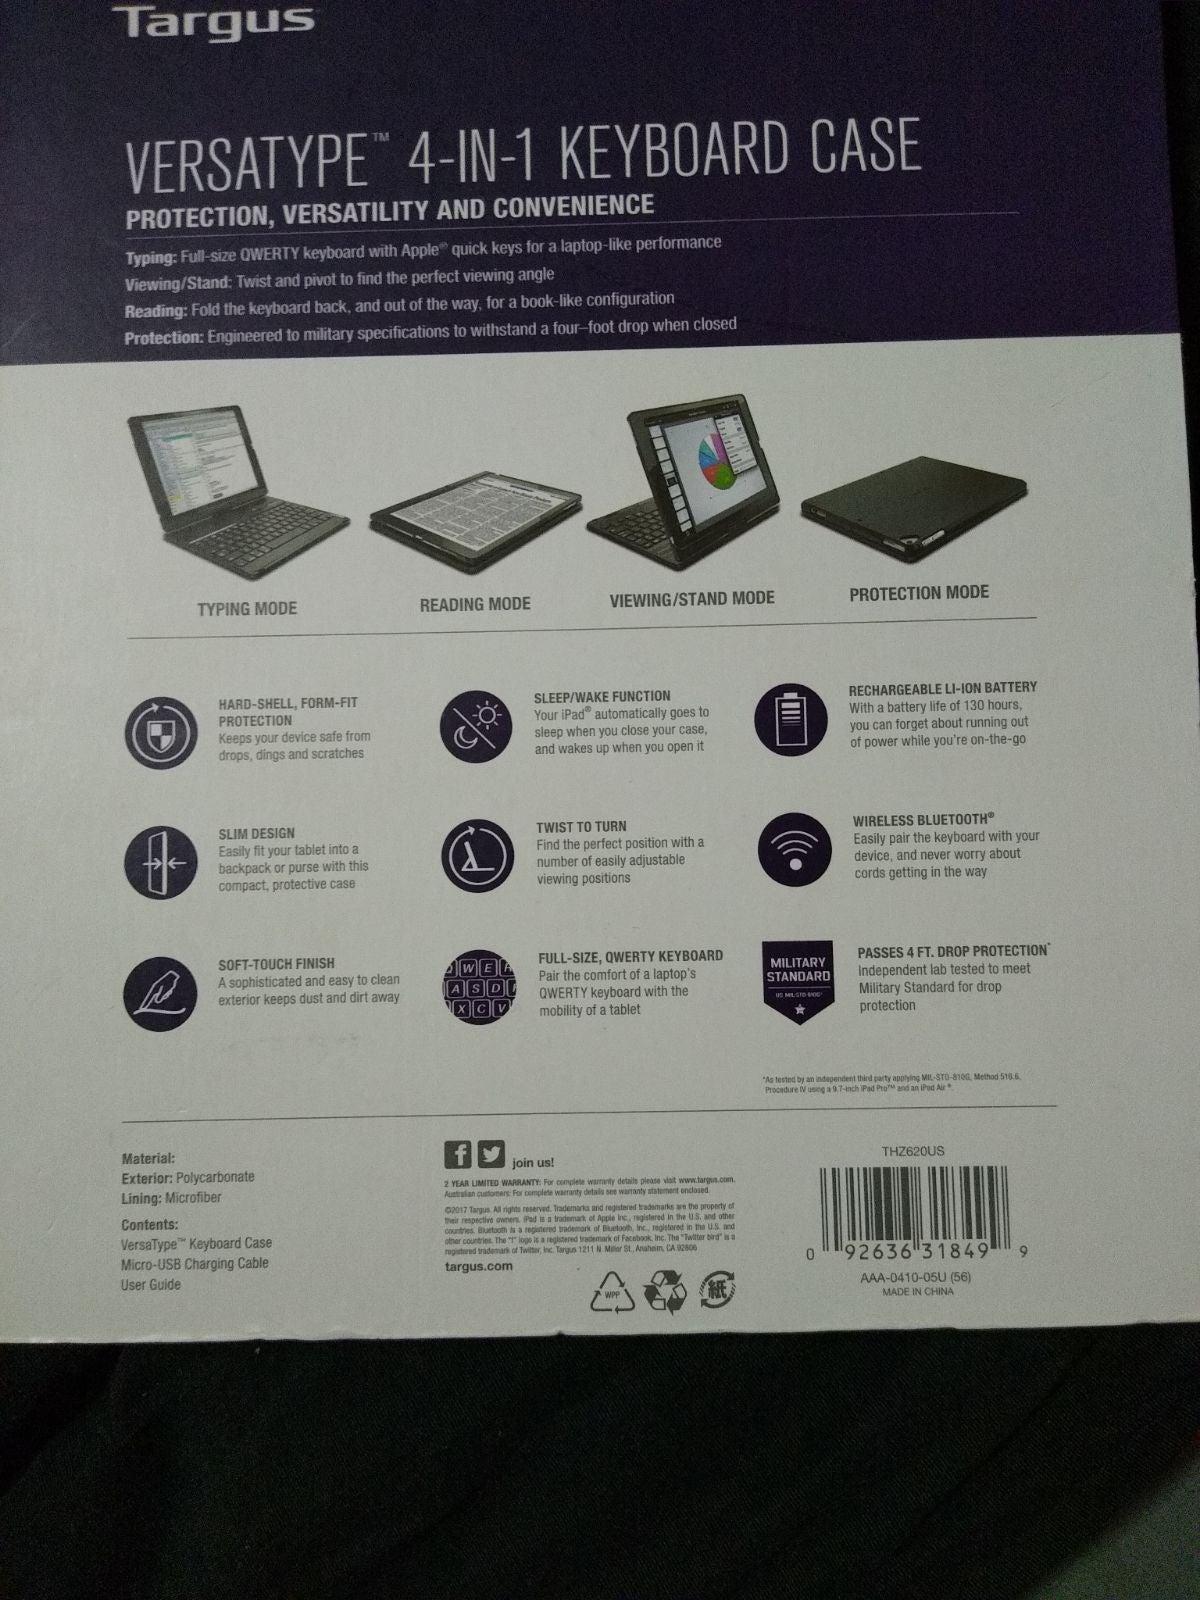 Versatype 4 in 1 Keyboard case